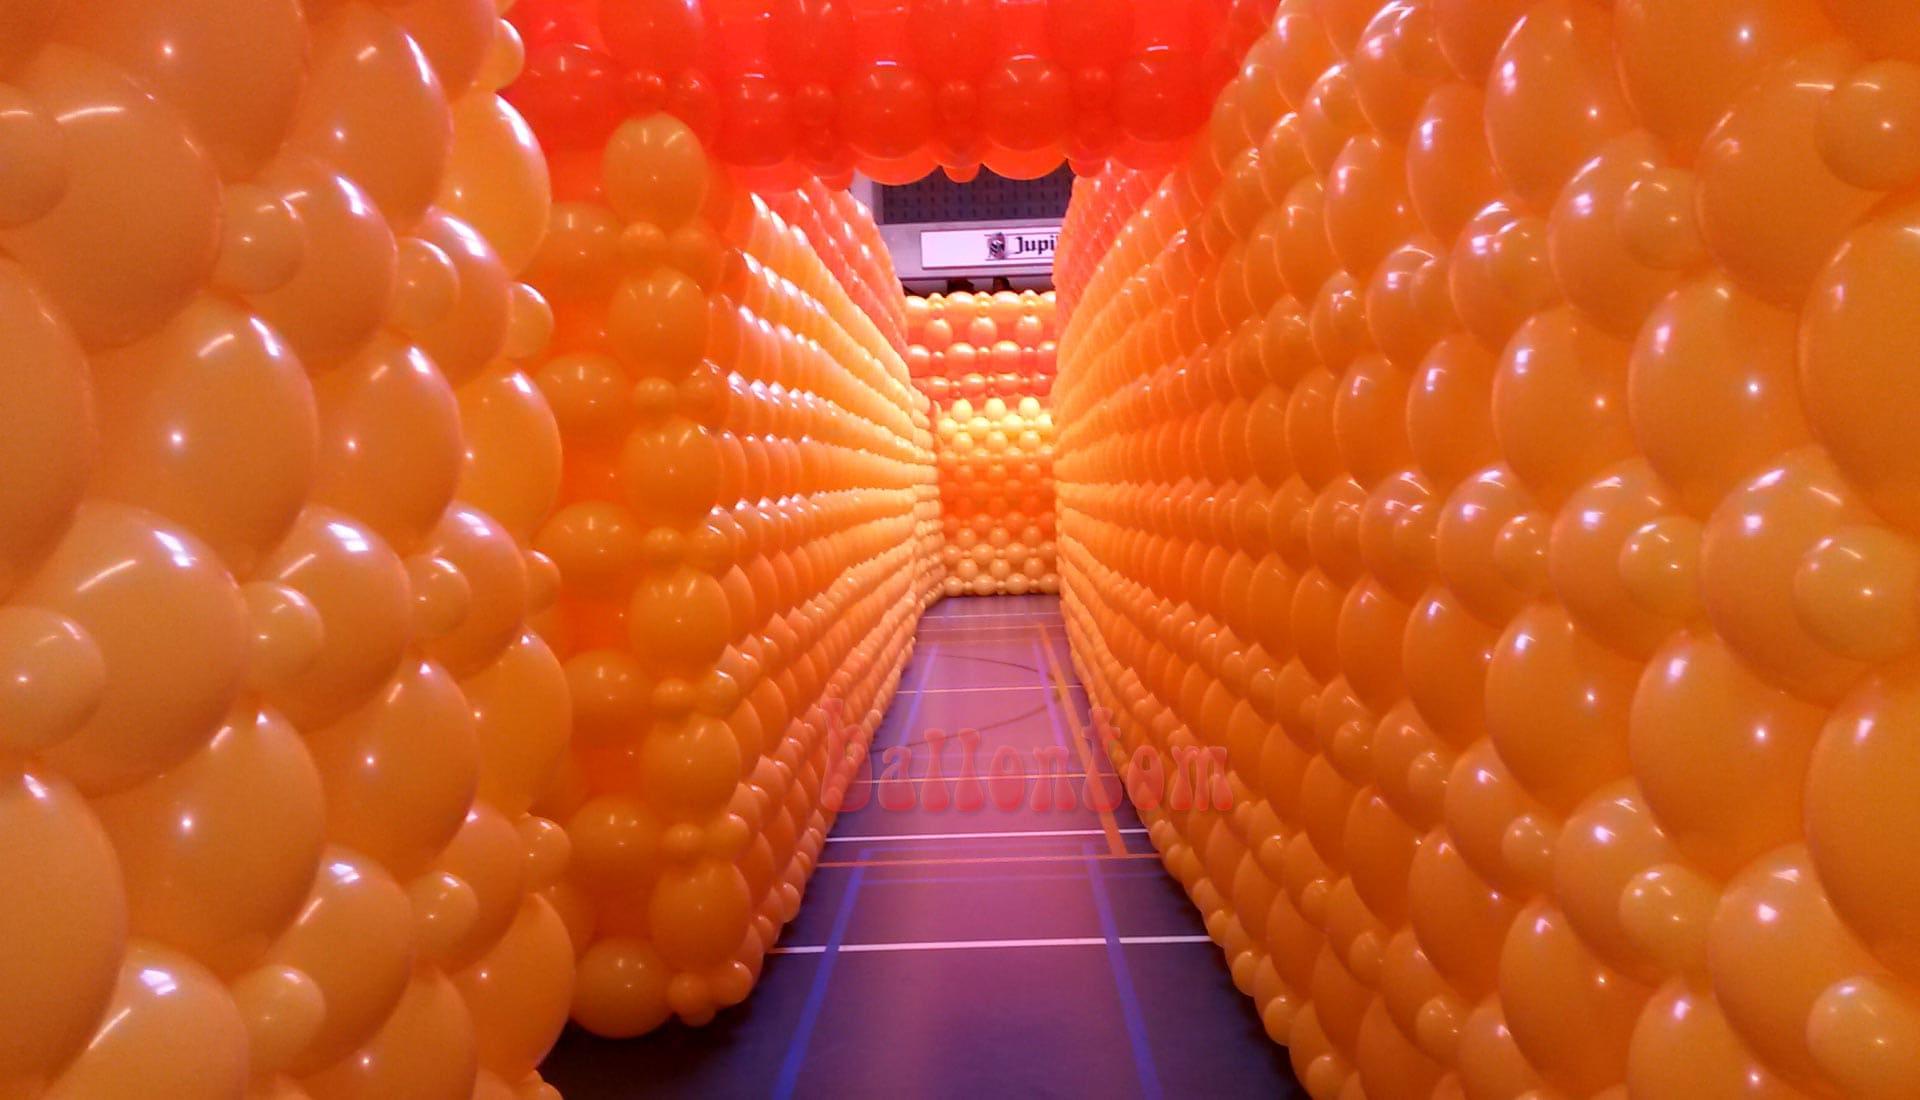 Weltrekord! Größtes Ballonlabyrinth mit über 100.000 Ballons mit ballontom